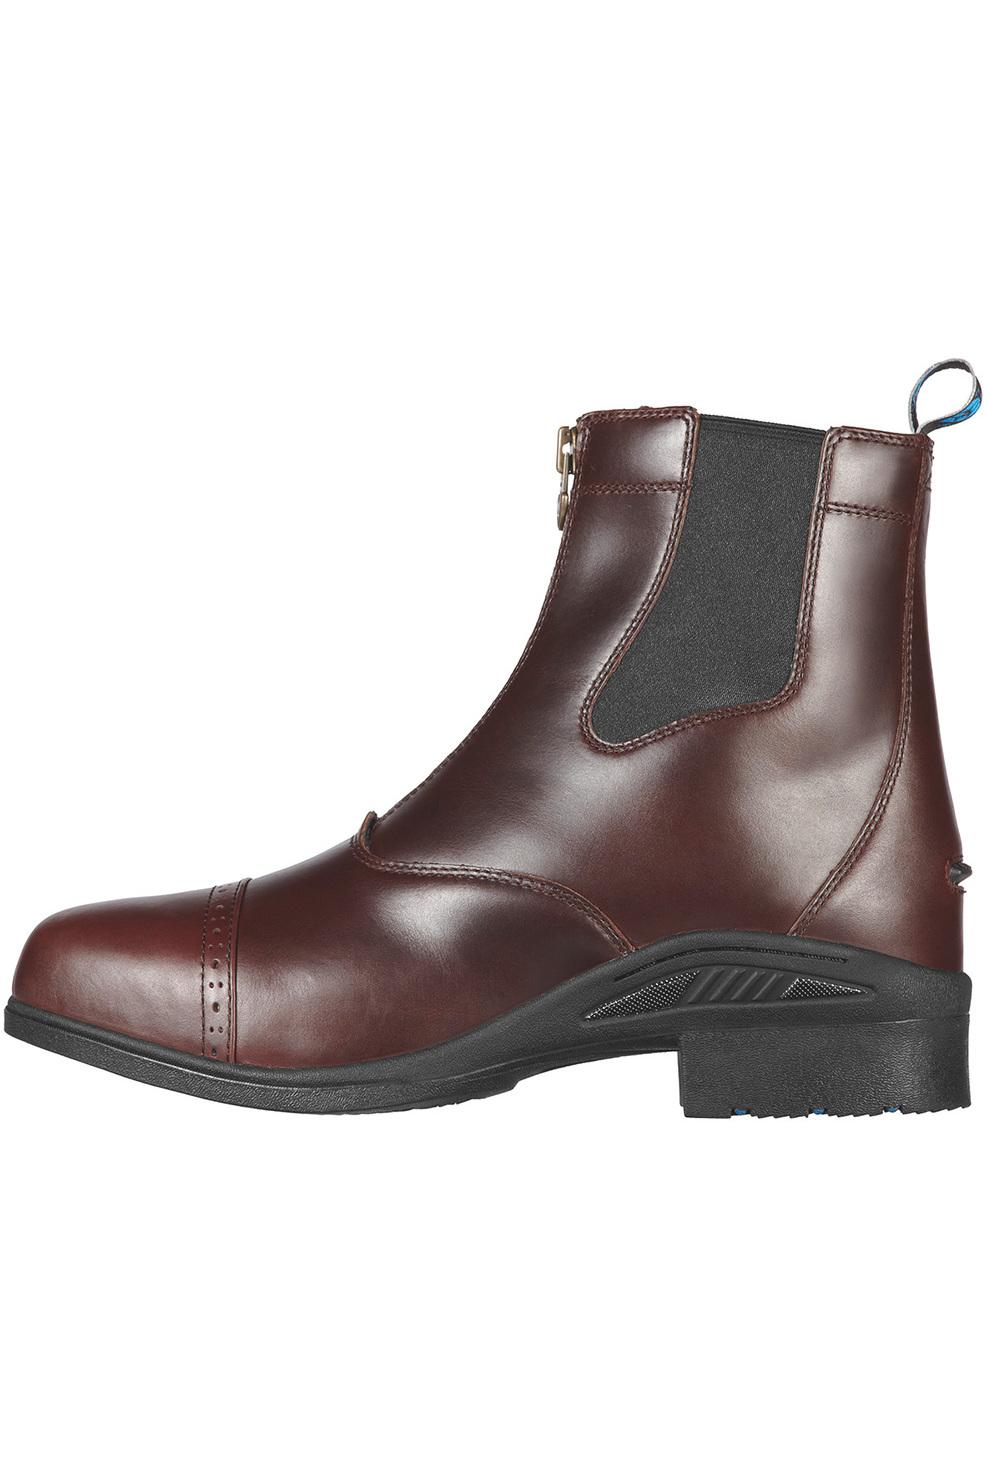 Ariat Short Riding Boots